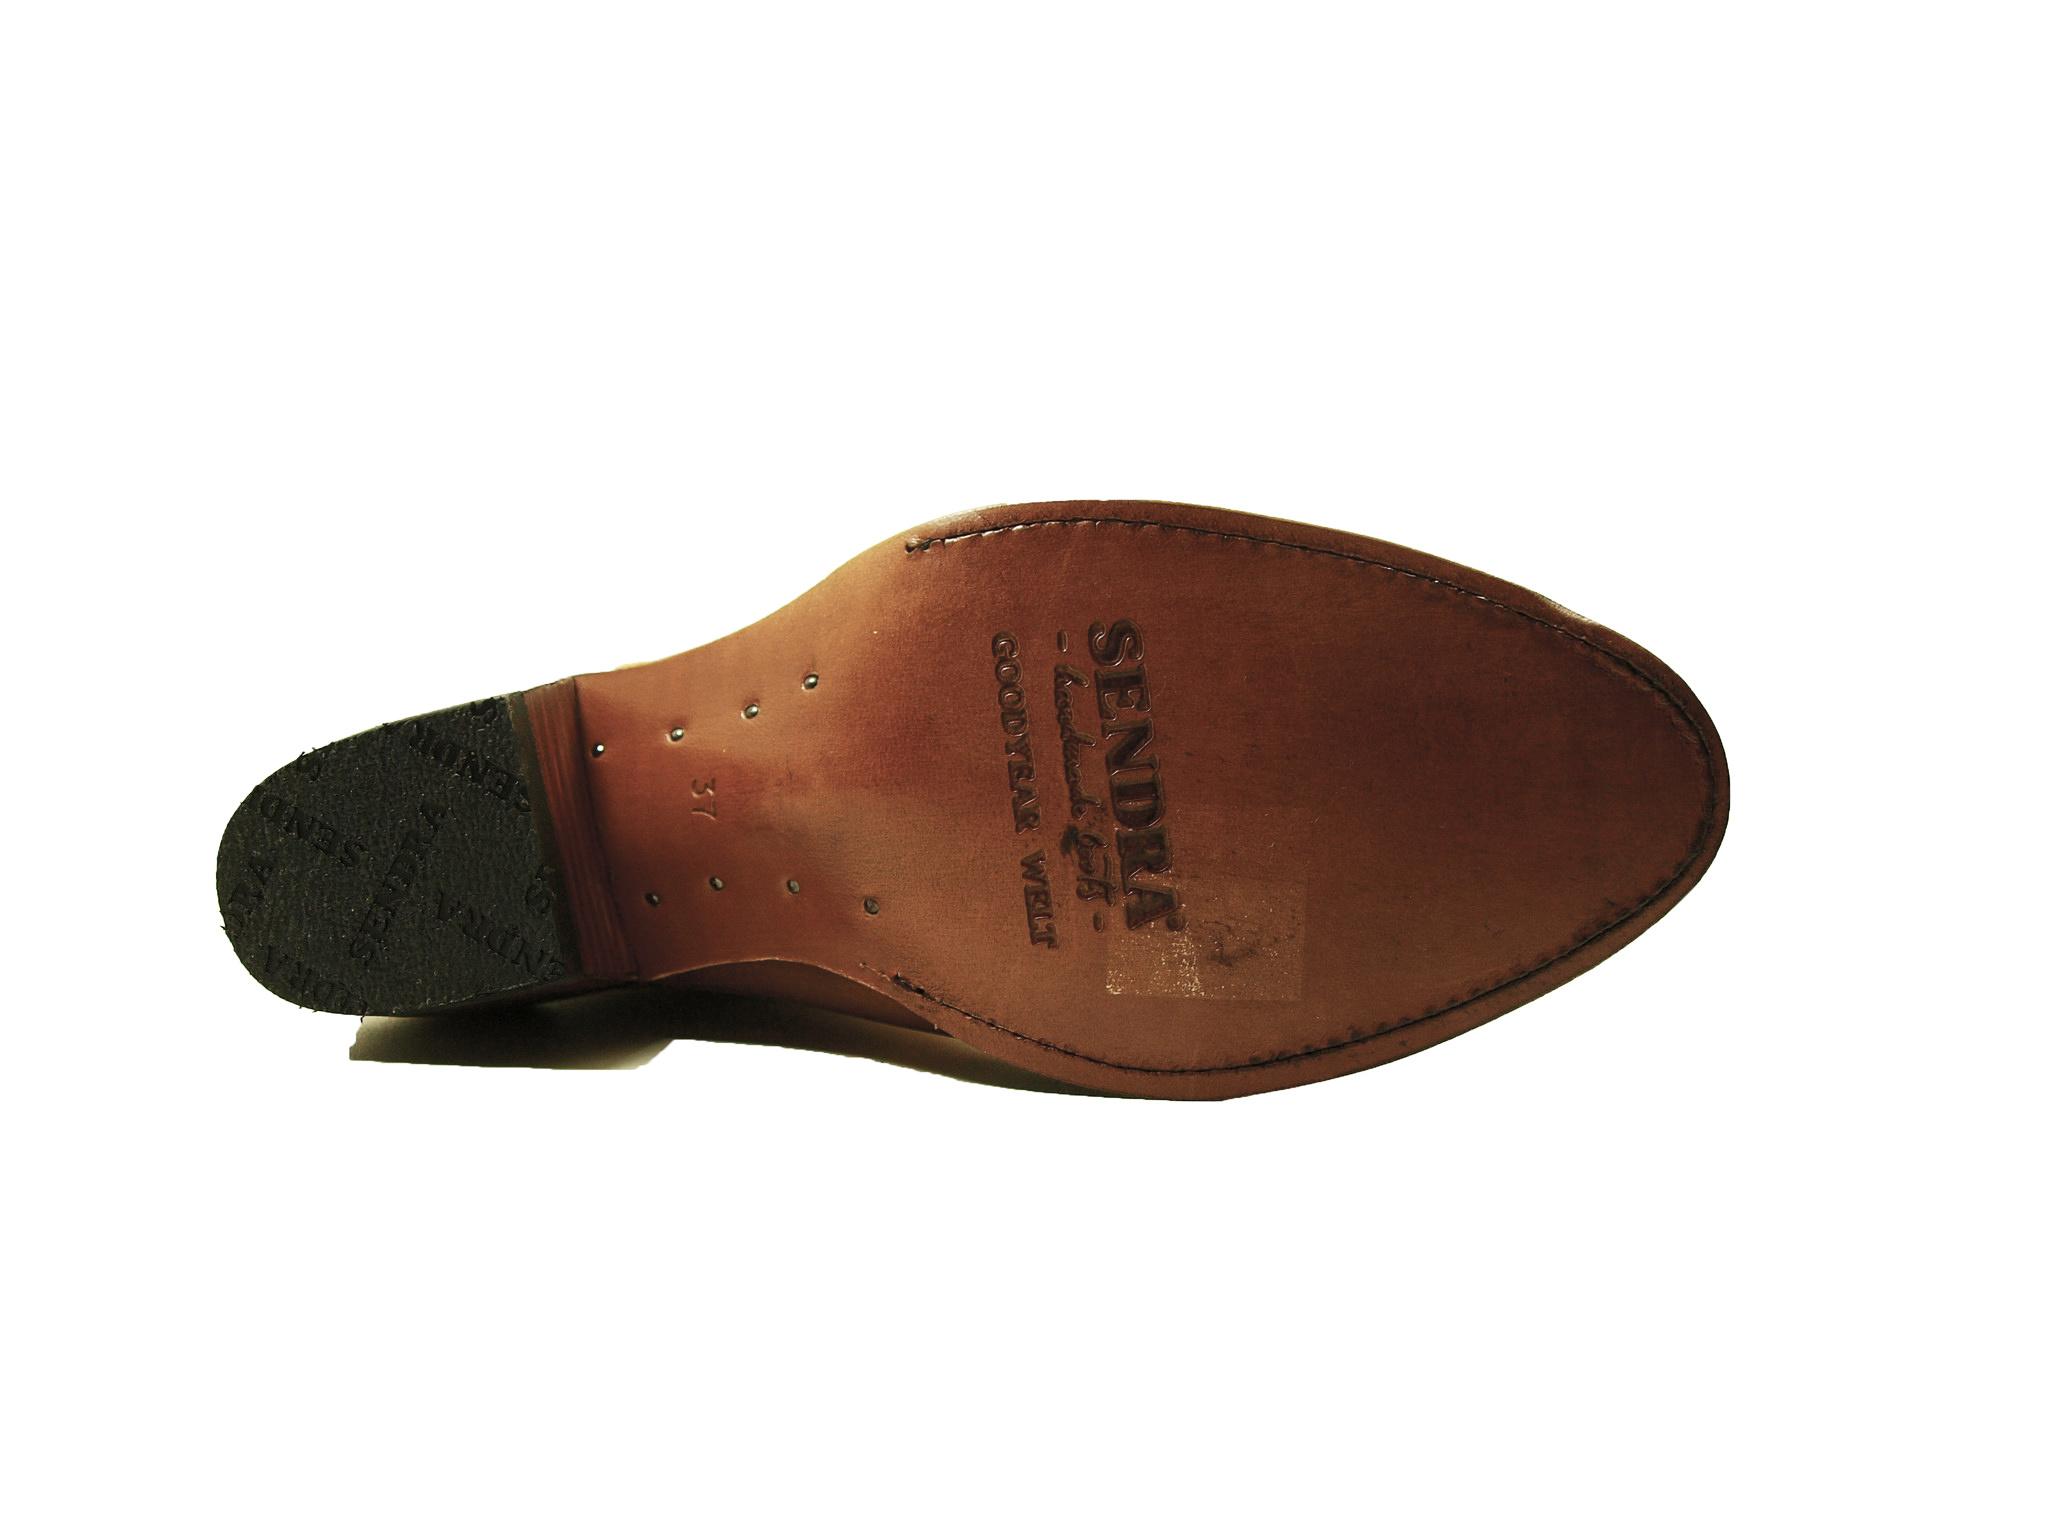 Sendra Boots Sendra 11627 Western Boots Cognac (Lavado) Nubuck